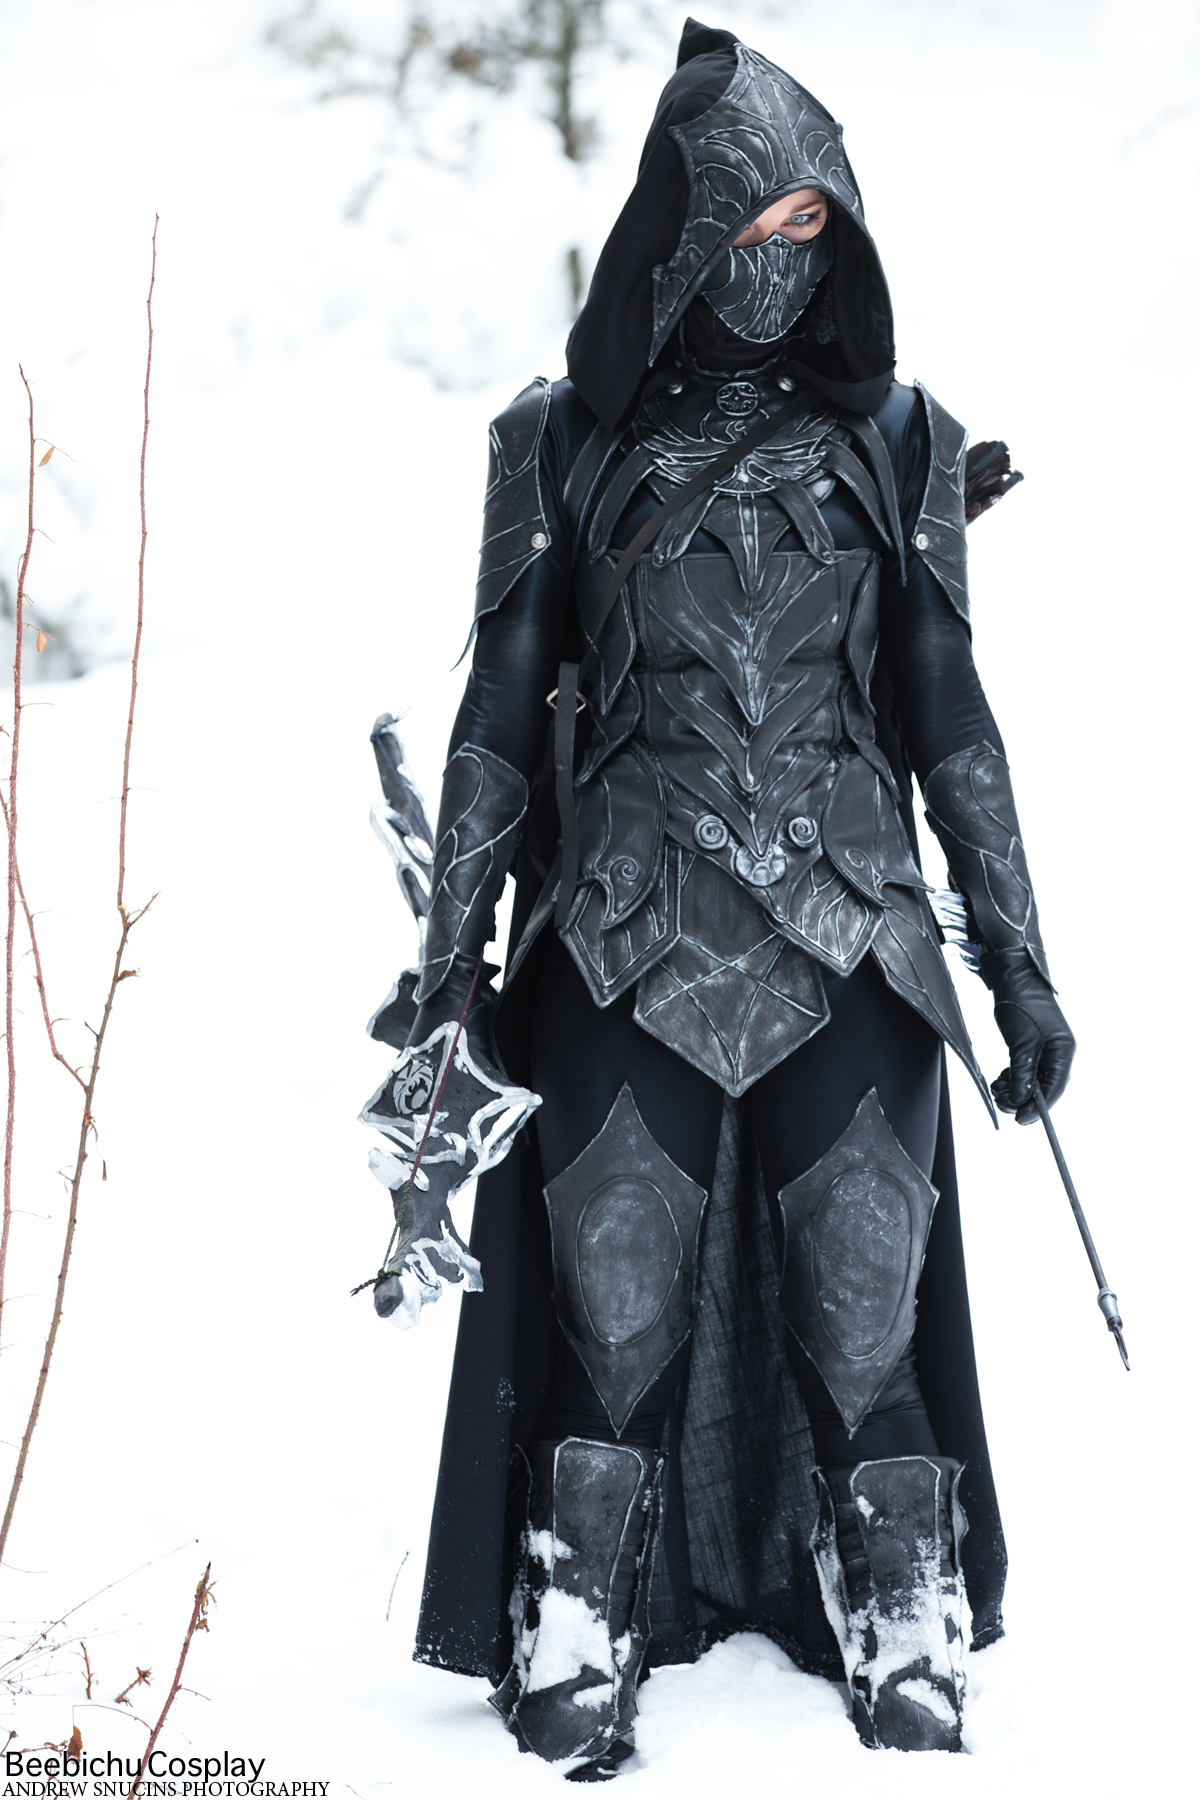 Nightingale Armor Cosplay by Beebichu